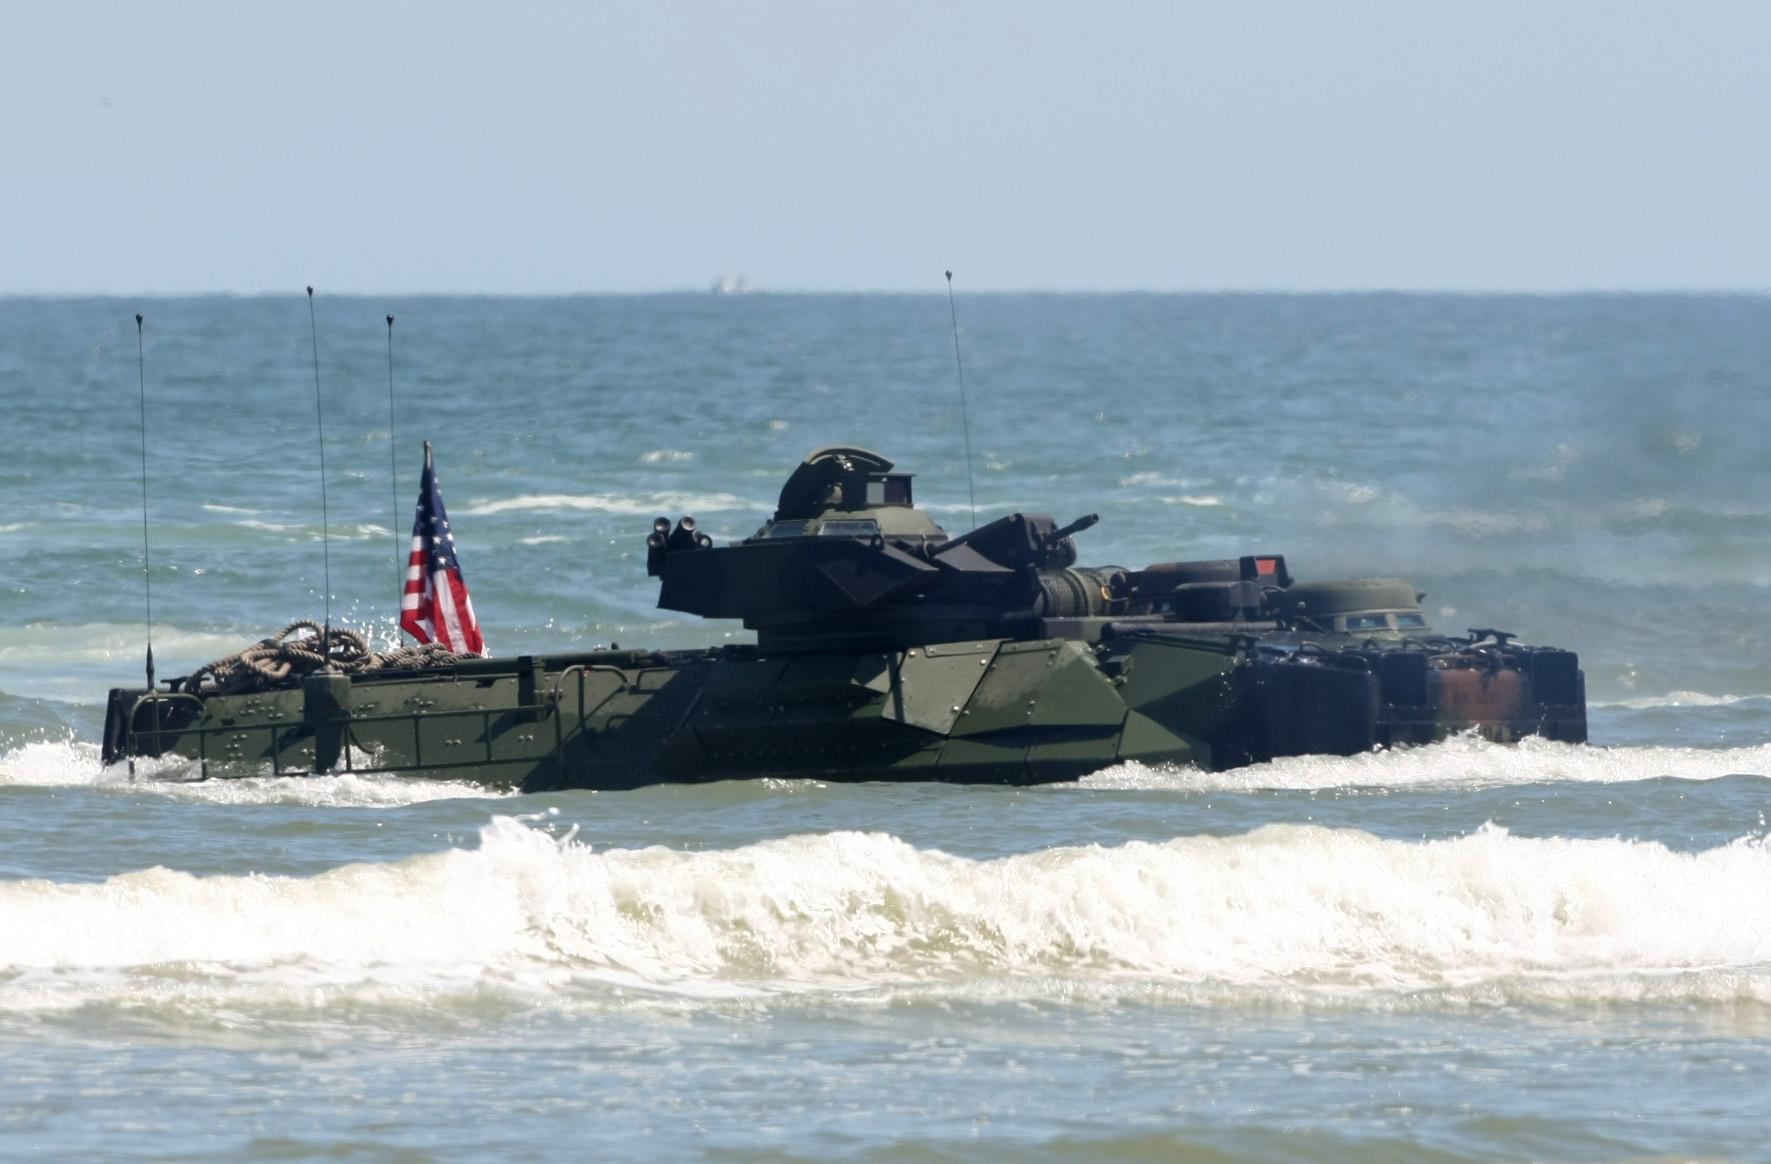 US_Navy_090425-M-9917S-242_A_Marine_Corps.jpg